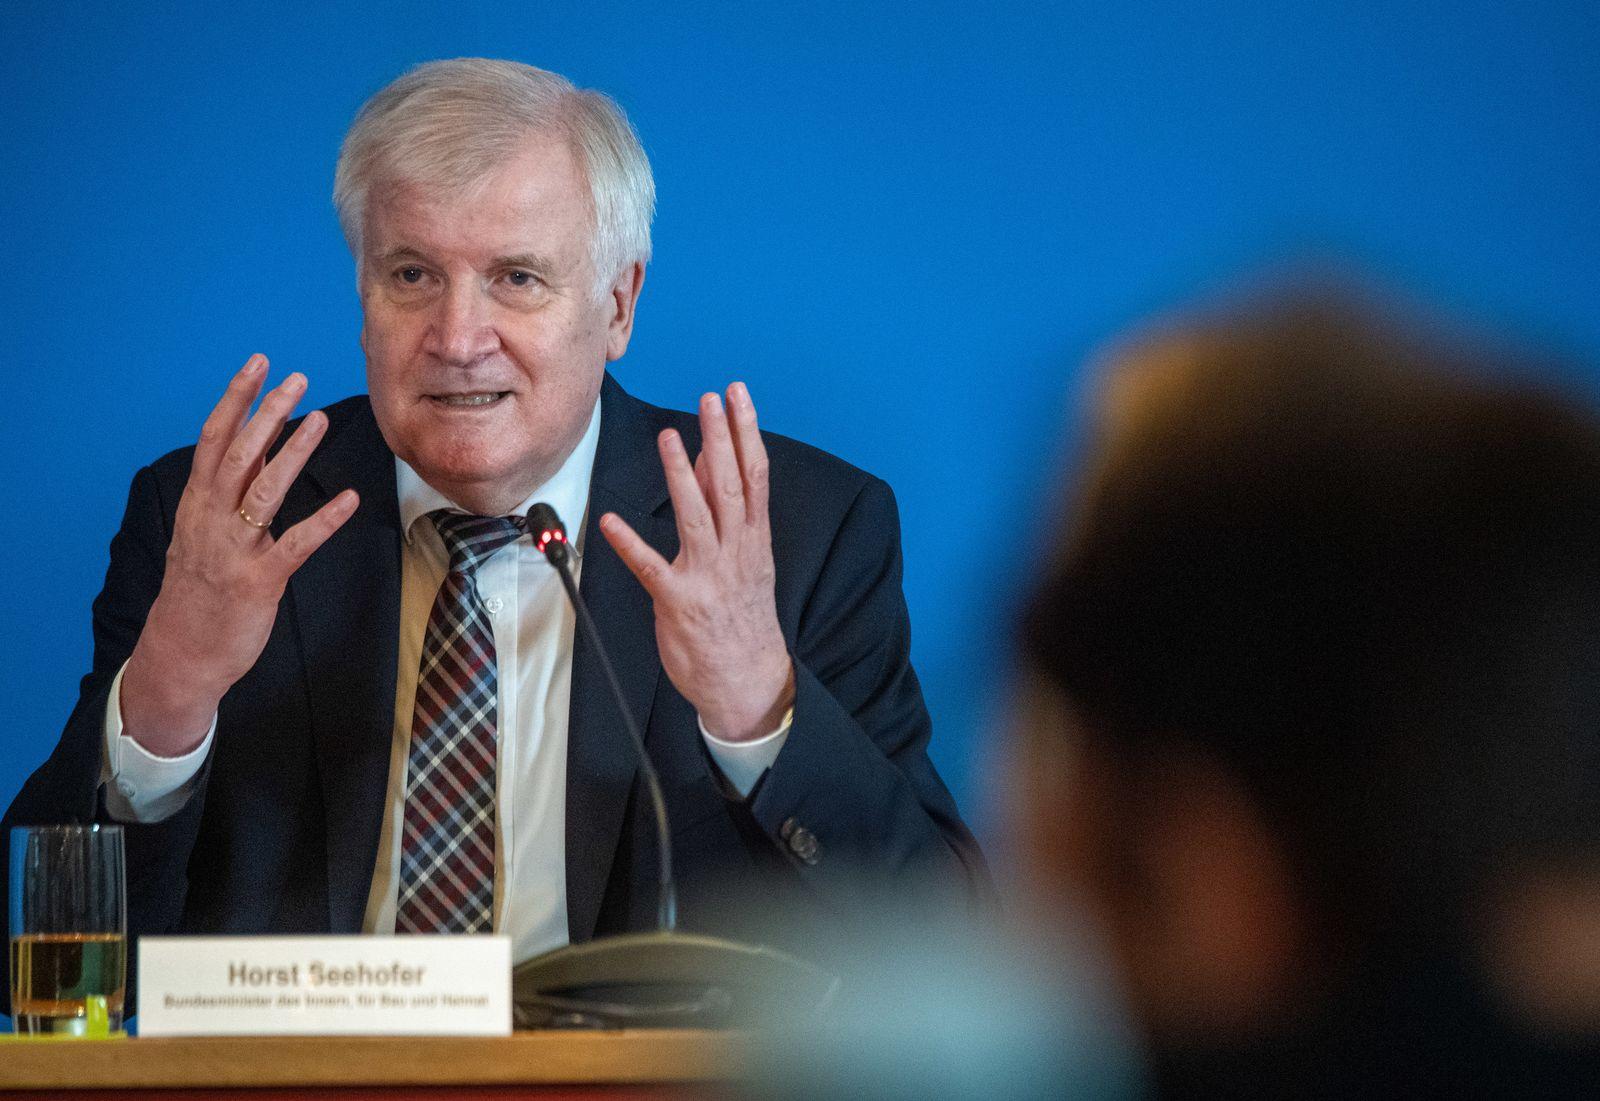 Bundesinnenminister Seehofer besucht Mecklenburg-Vorpommern